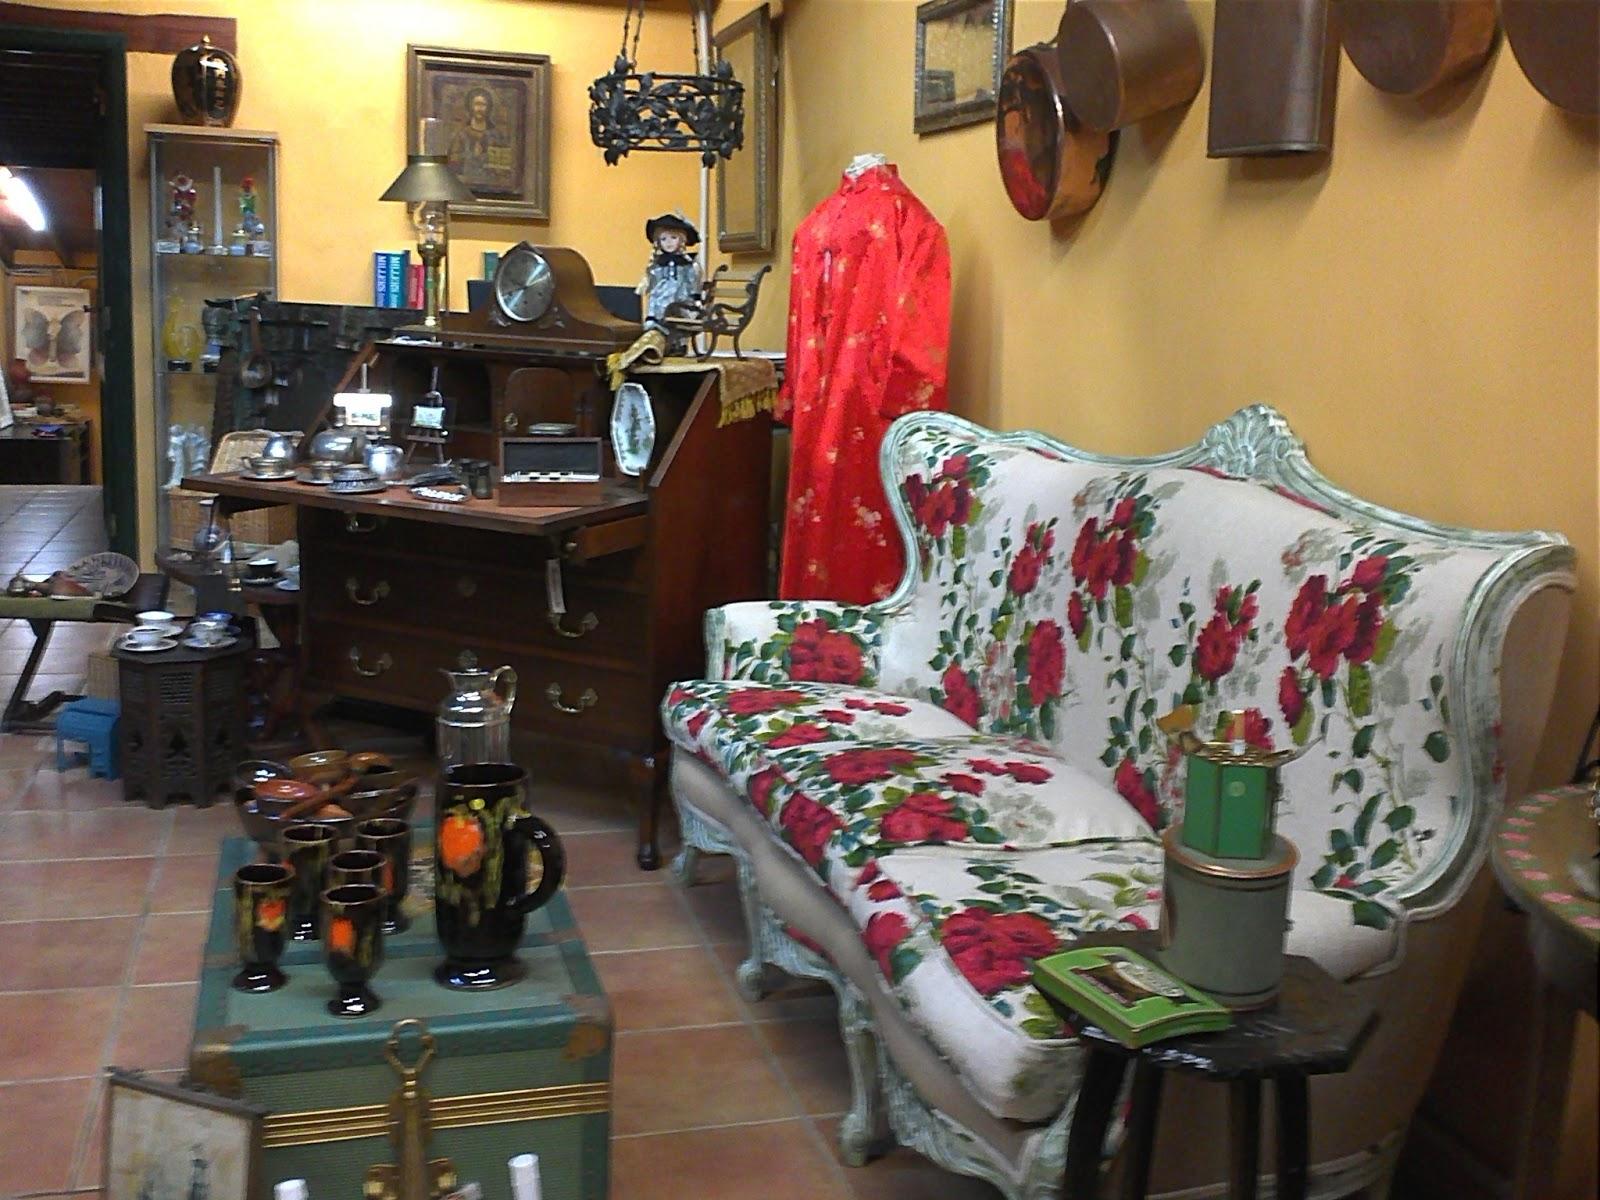 Muebles Tacoronte - Restaurata Taller De Restauraci N Espacio Restaurata[mjhdah]https://www.alquilotucasa.com/imagecache/original/fotos/2685/5396253/3-4.jpg